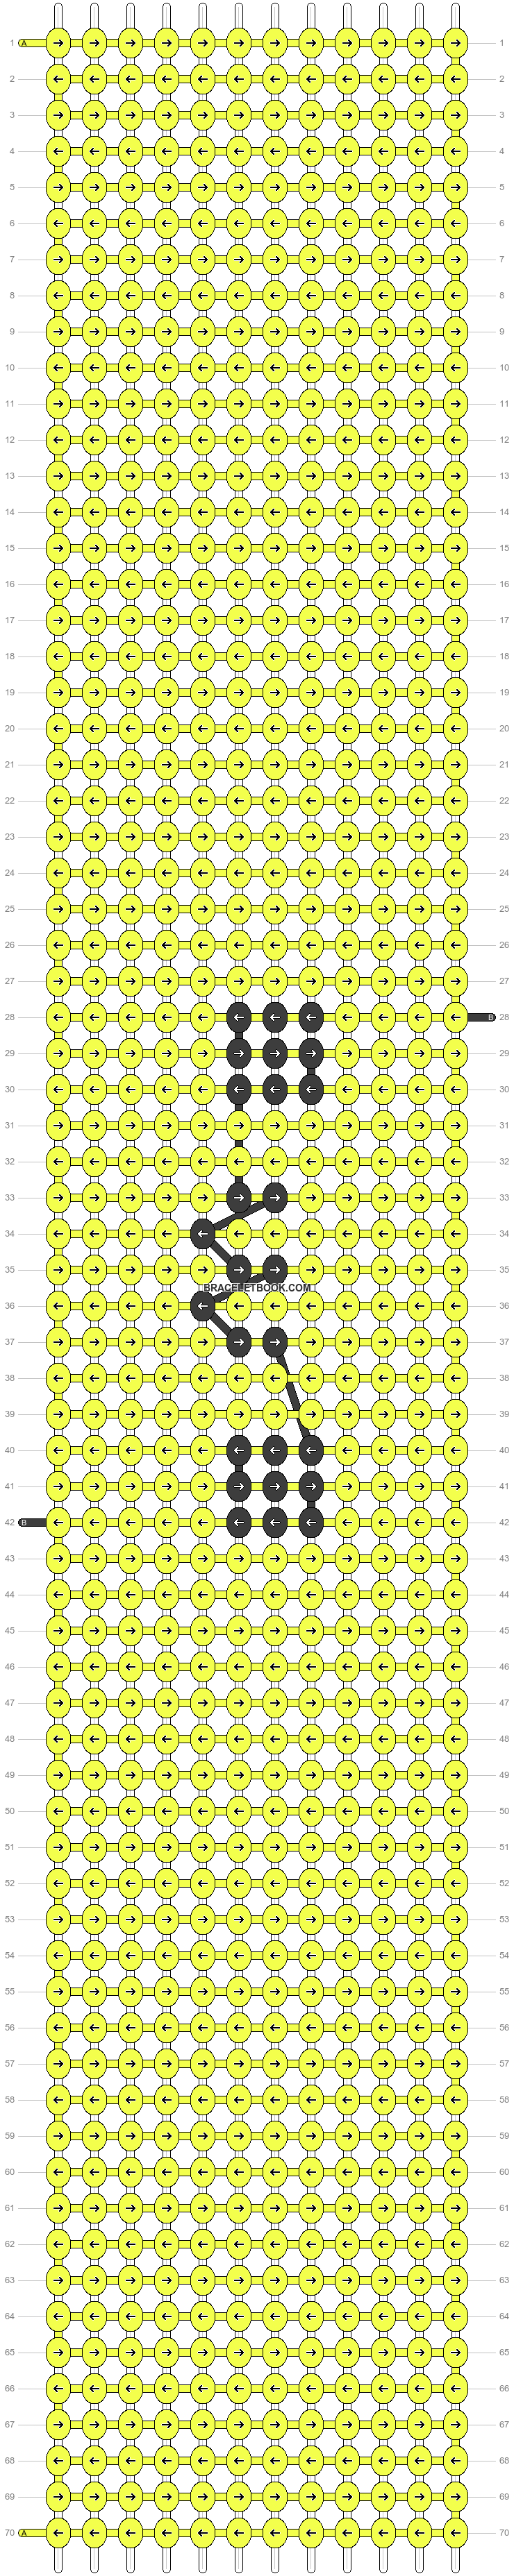 Alpha pattern #45878 pattern